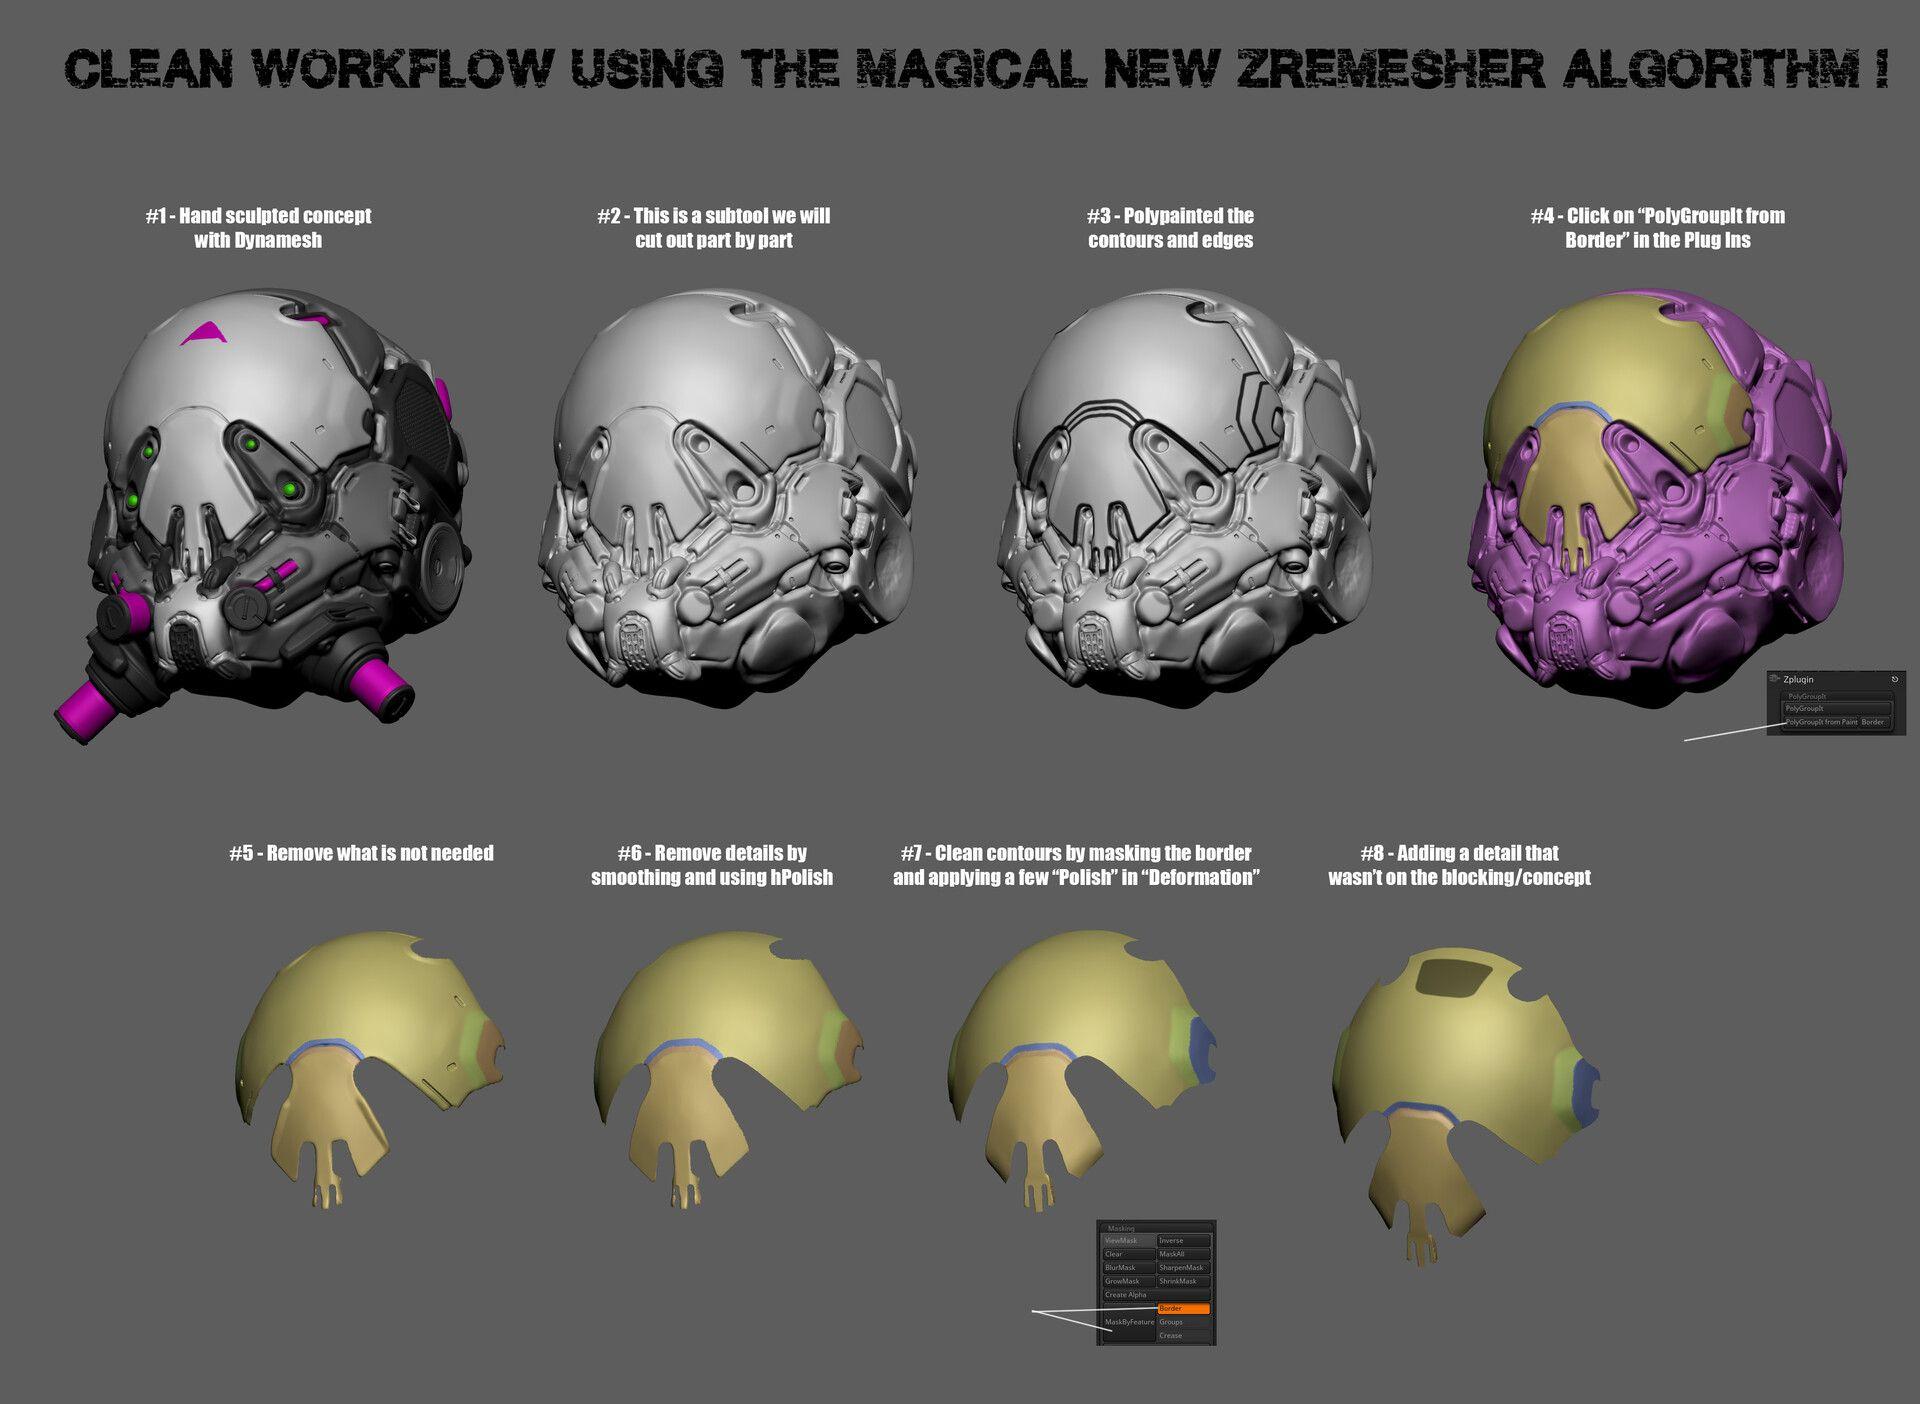 ArtStation - Zbrush 2019 ZRemesher workflow, Marco Plouffe